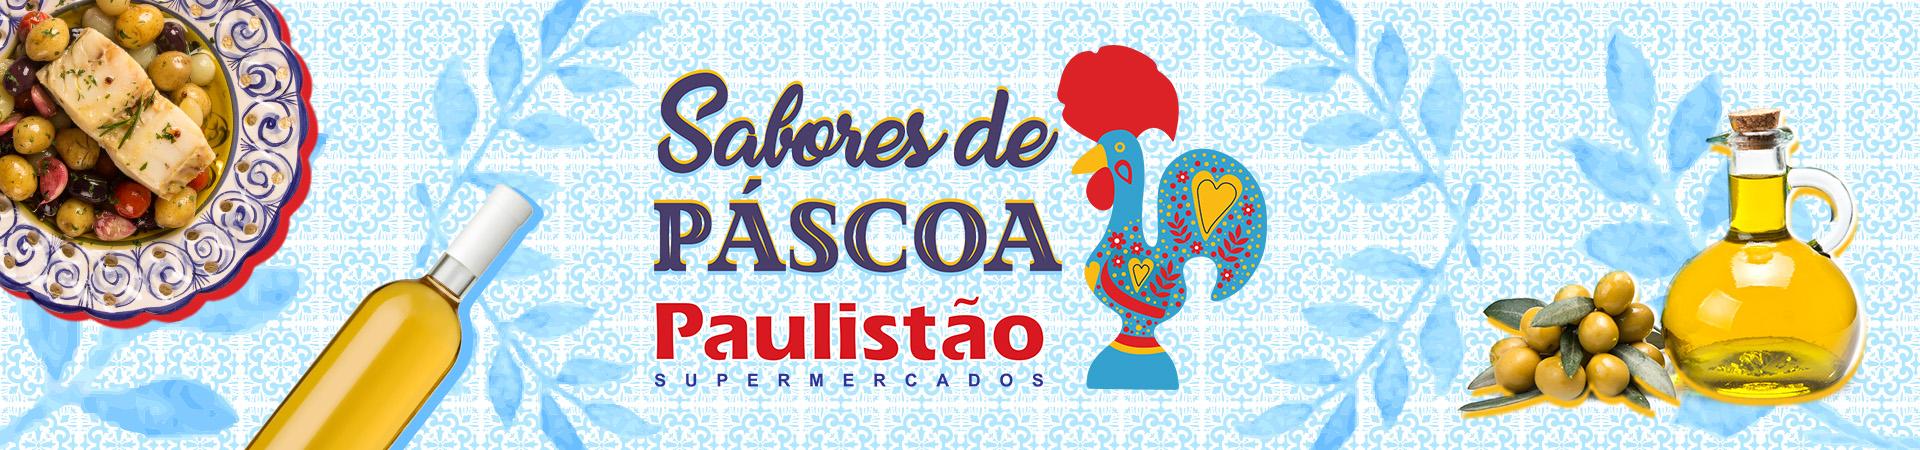 18-PAULISTÃO-3765A-PÁSCOA 2018-BANNER SITE 1920X450PX - FINAL